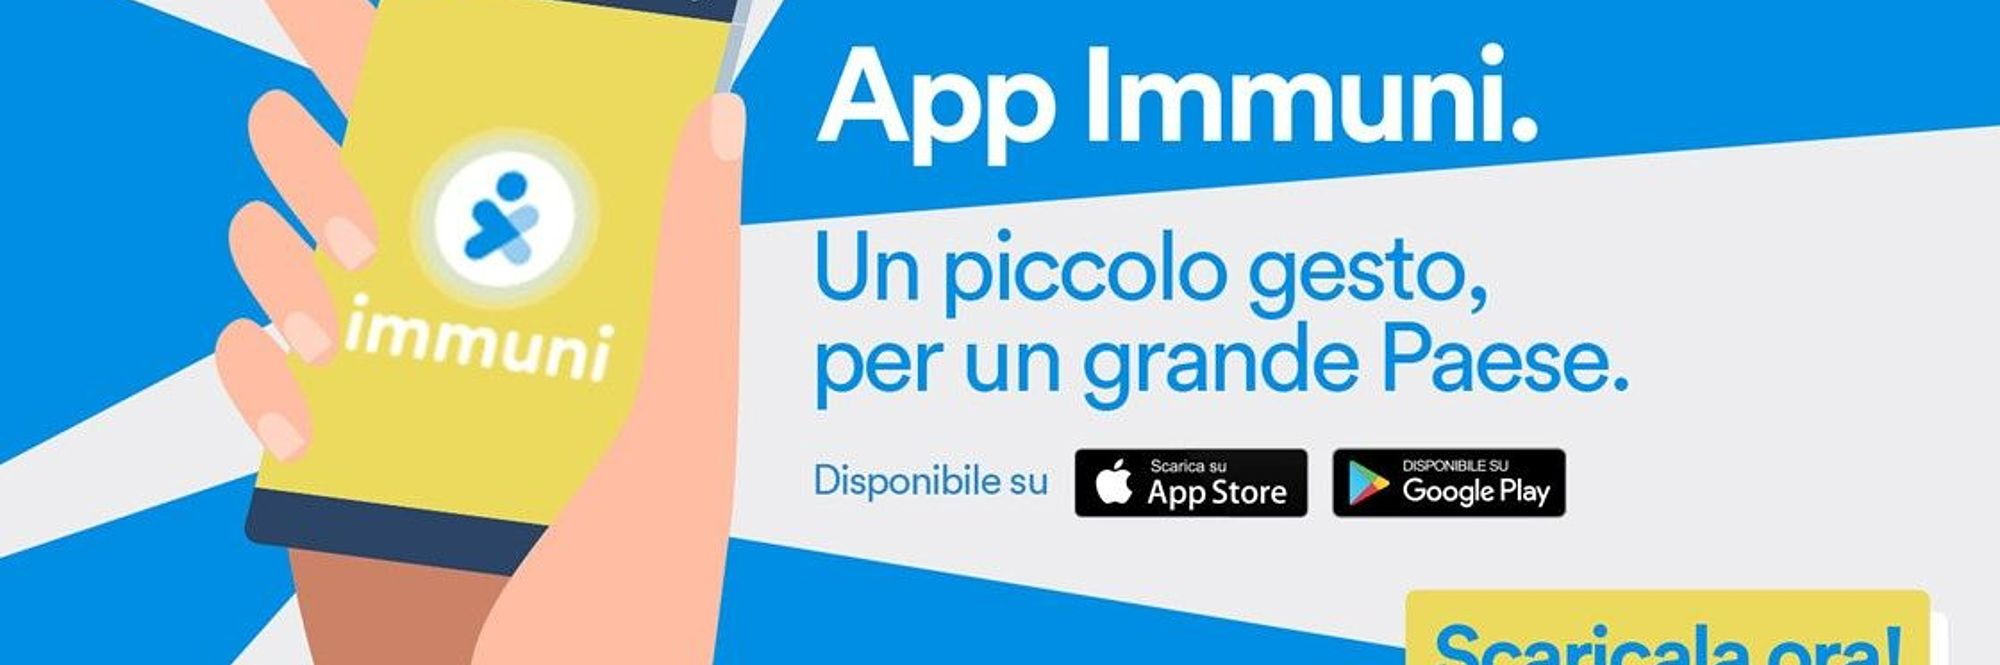 grafica app immuni